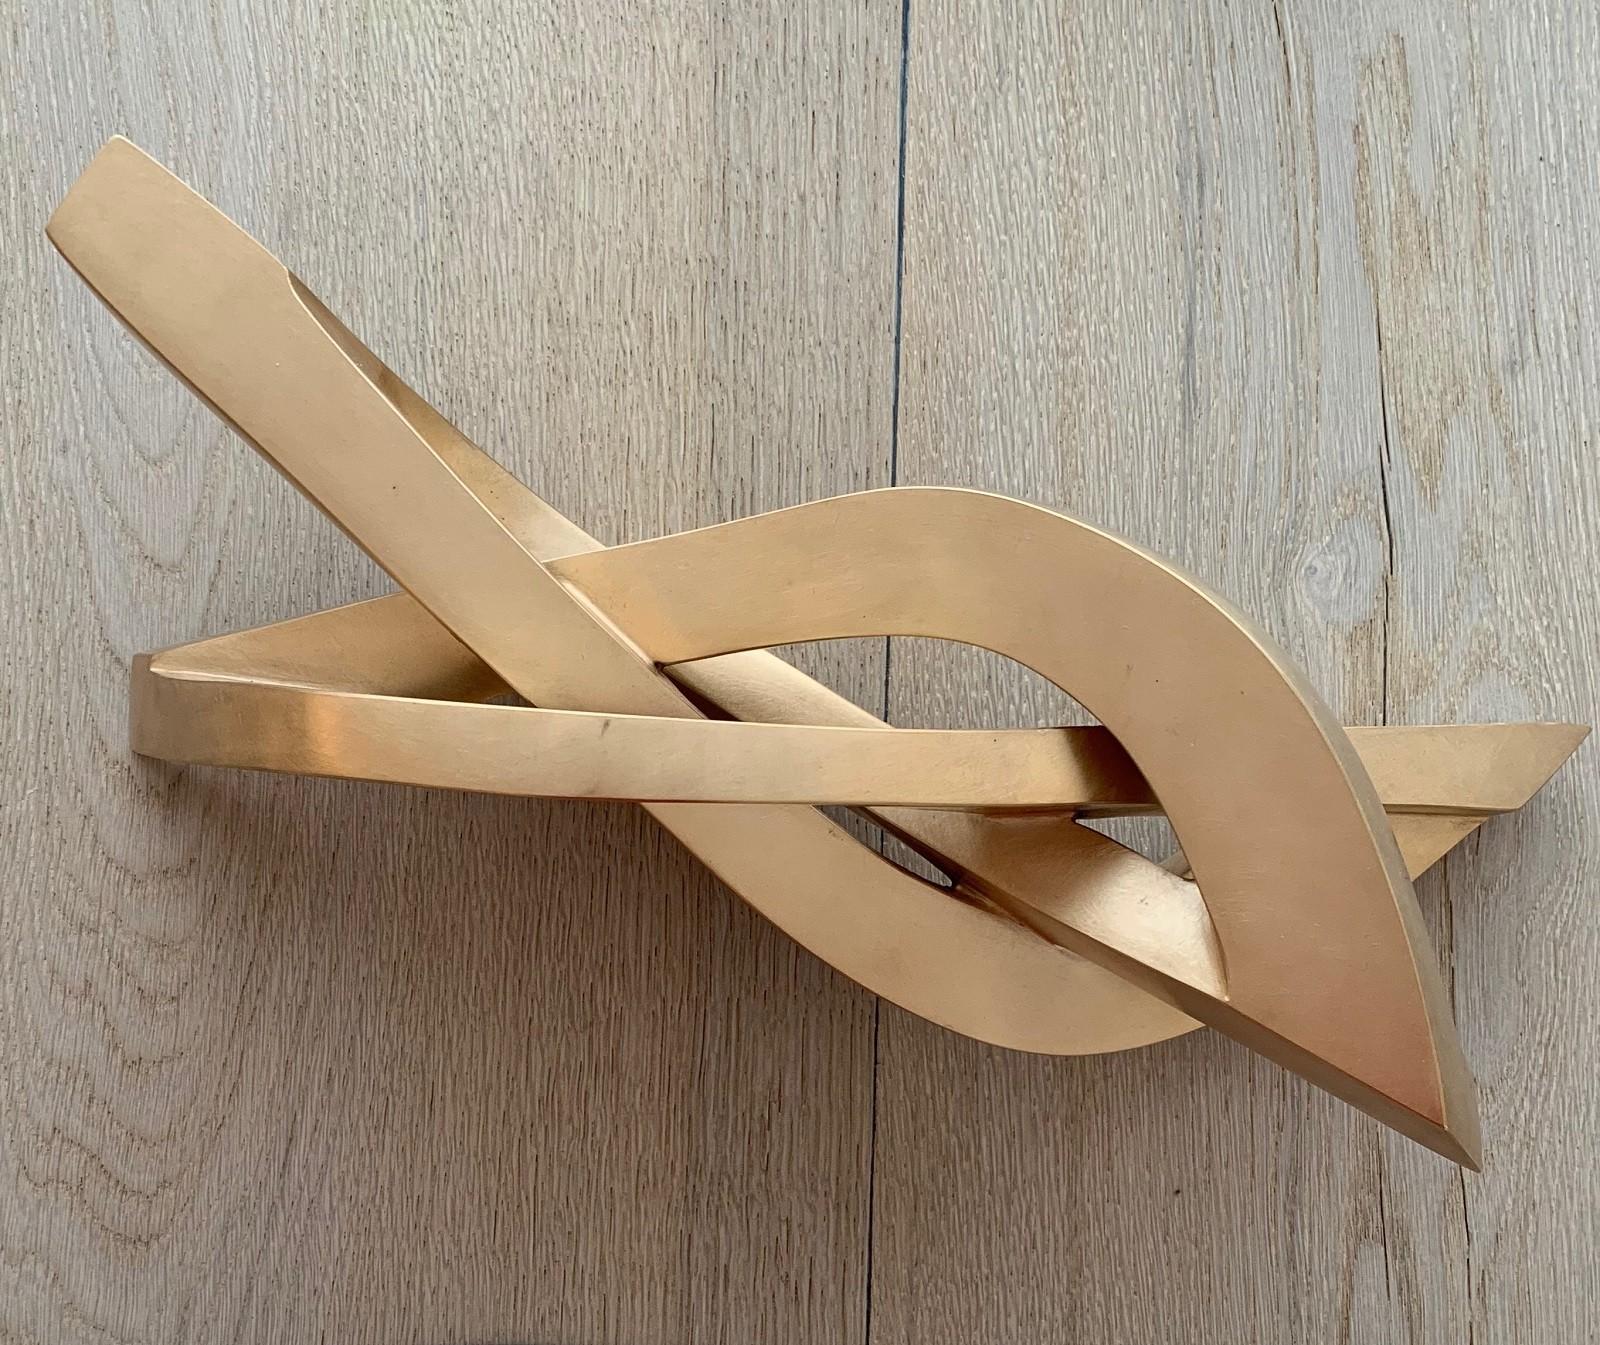 Flighting Curves and arrows - Verhas, Maximilian - k-VR116